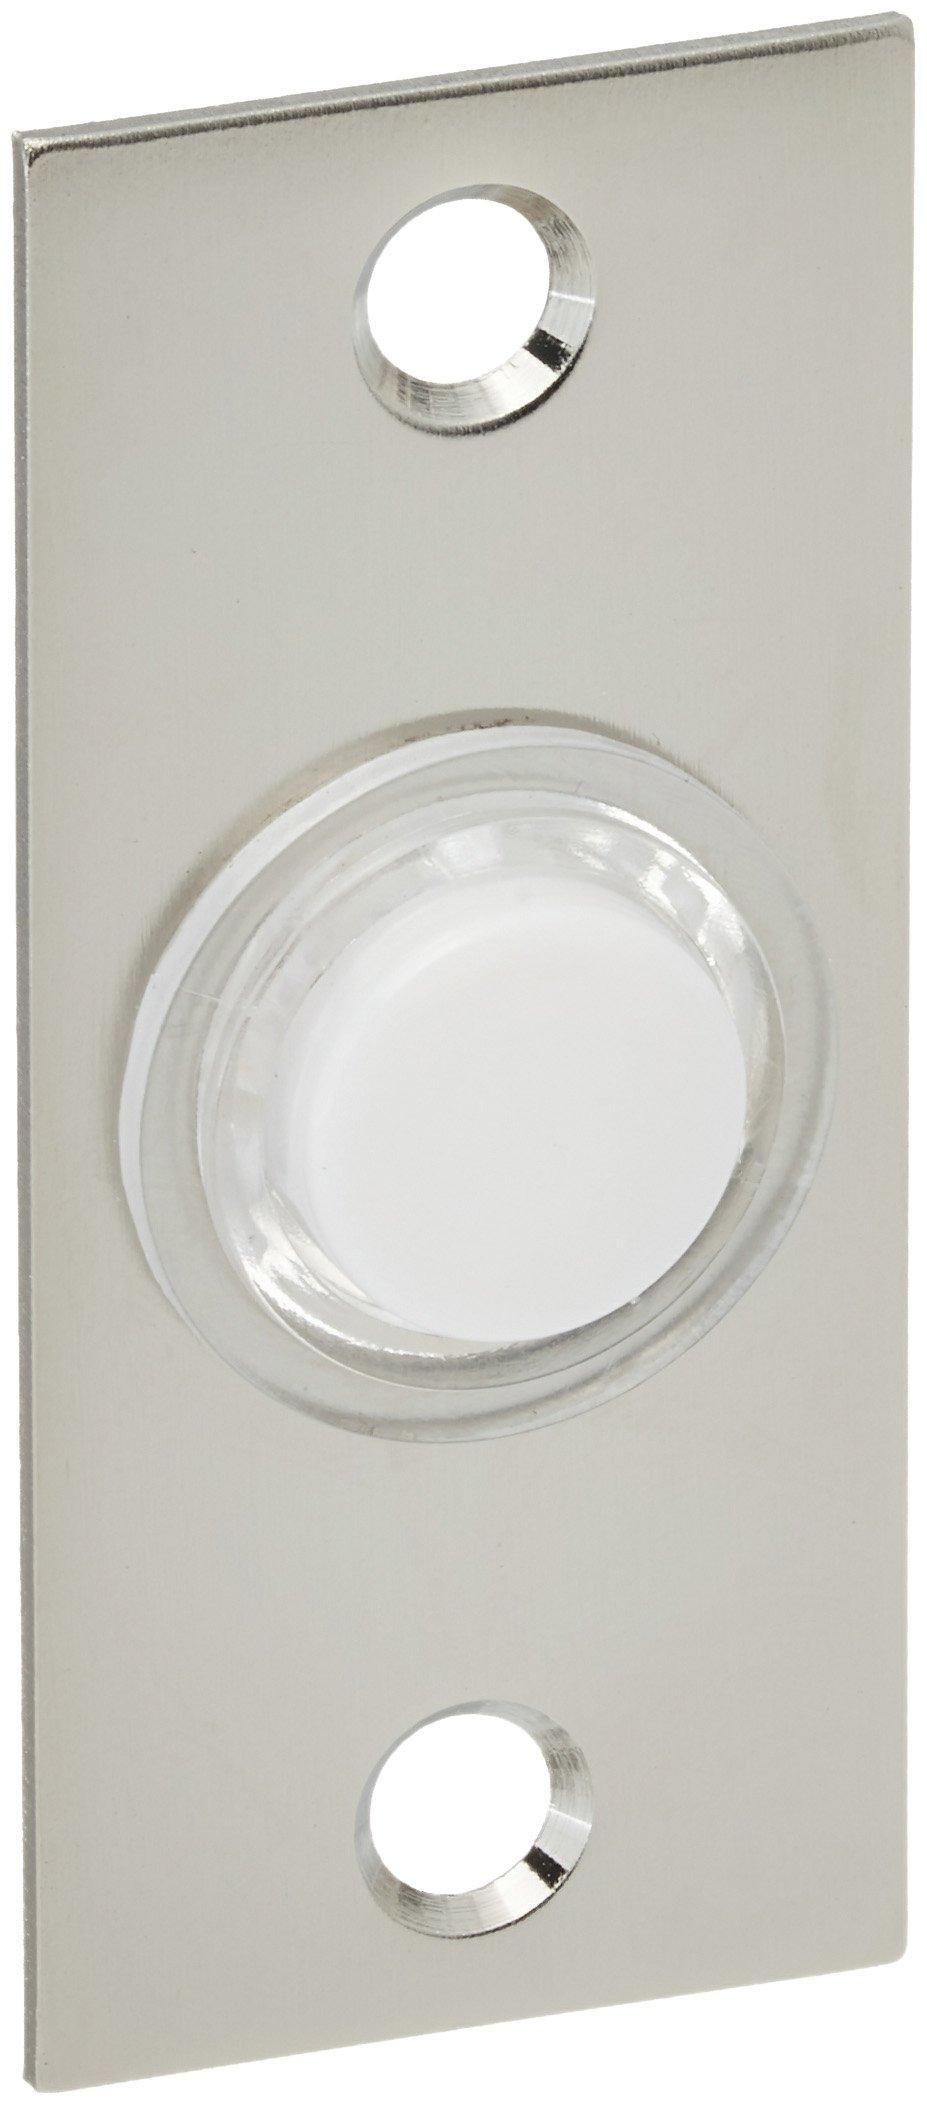 Baldwin 4853056 Rectangular Bell Button, Lifetime Satin Nickel